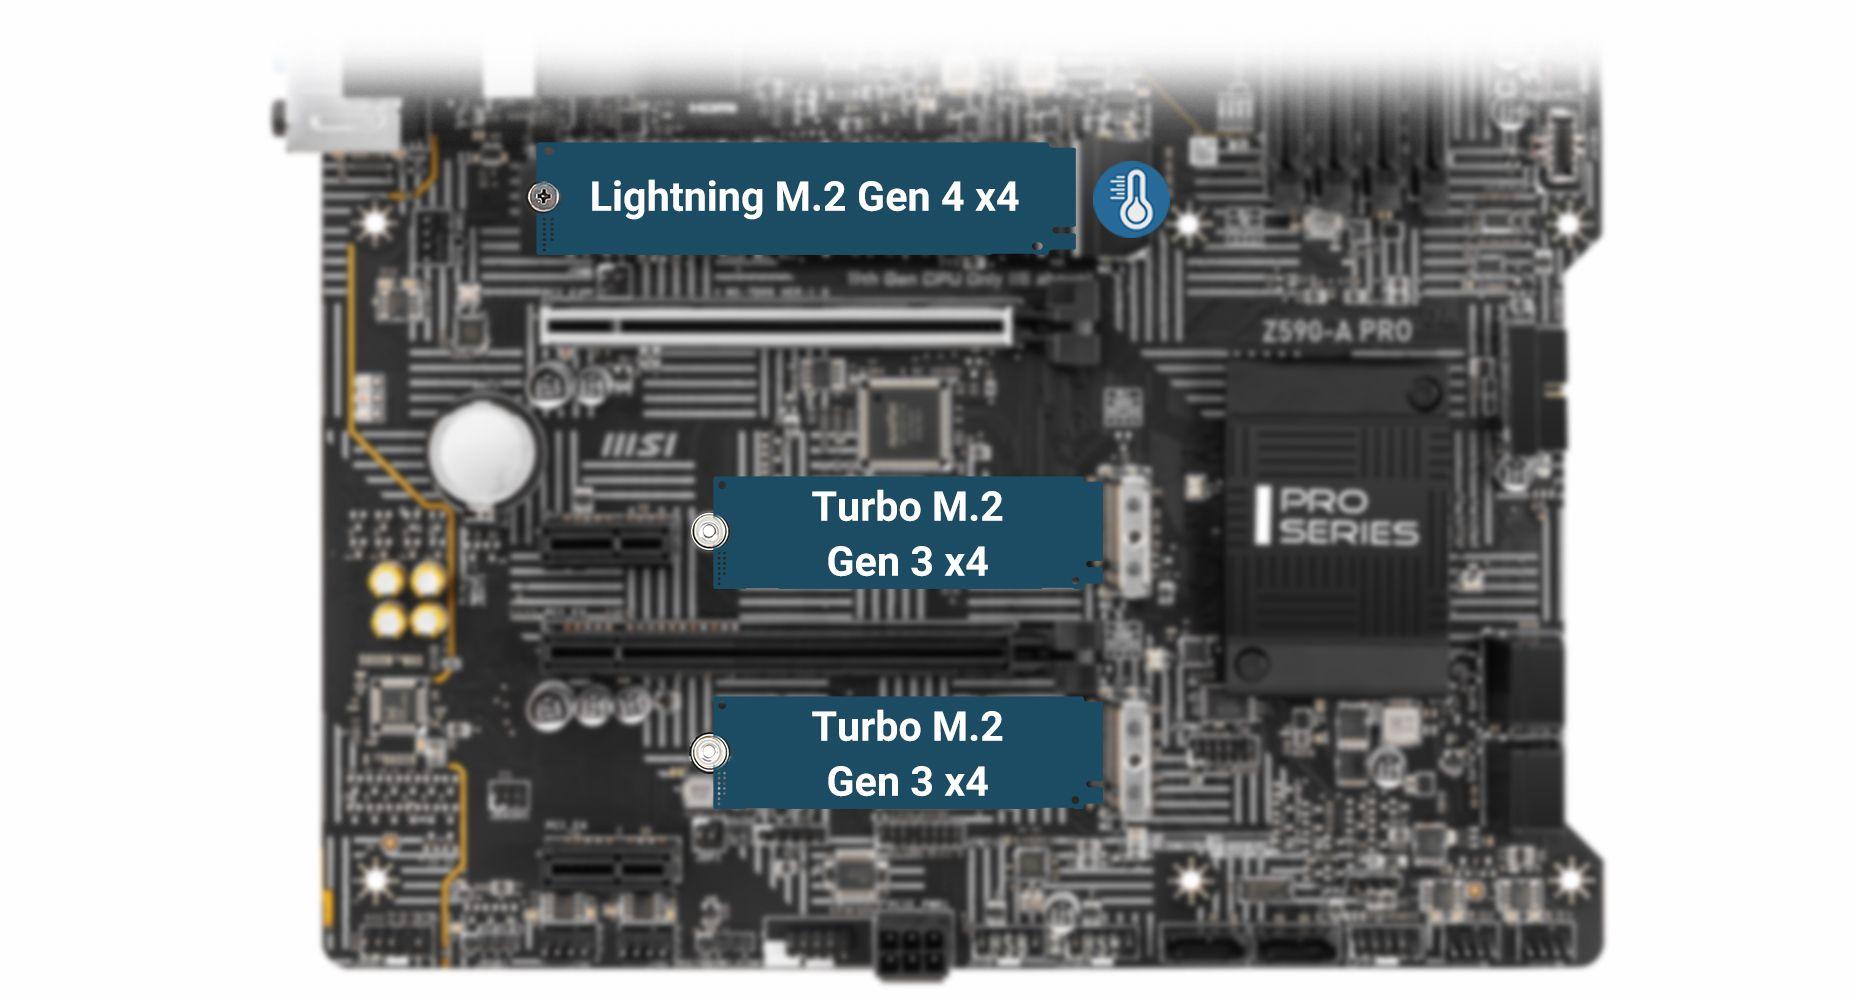 MSI Z590-A PRO LIGHTNING GEN 4 M.2 WITH M.2 SHIELD FROZR